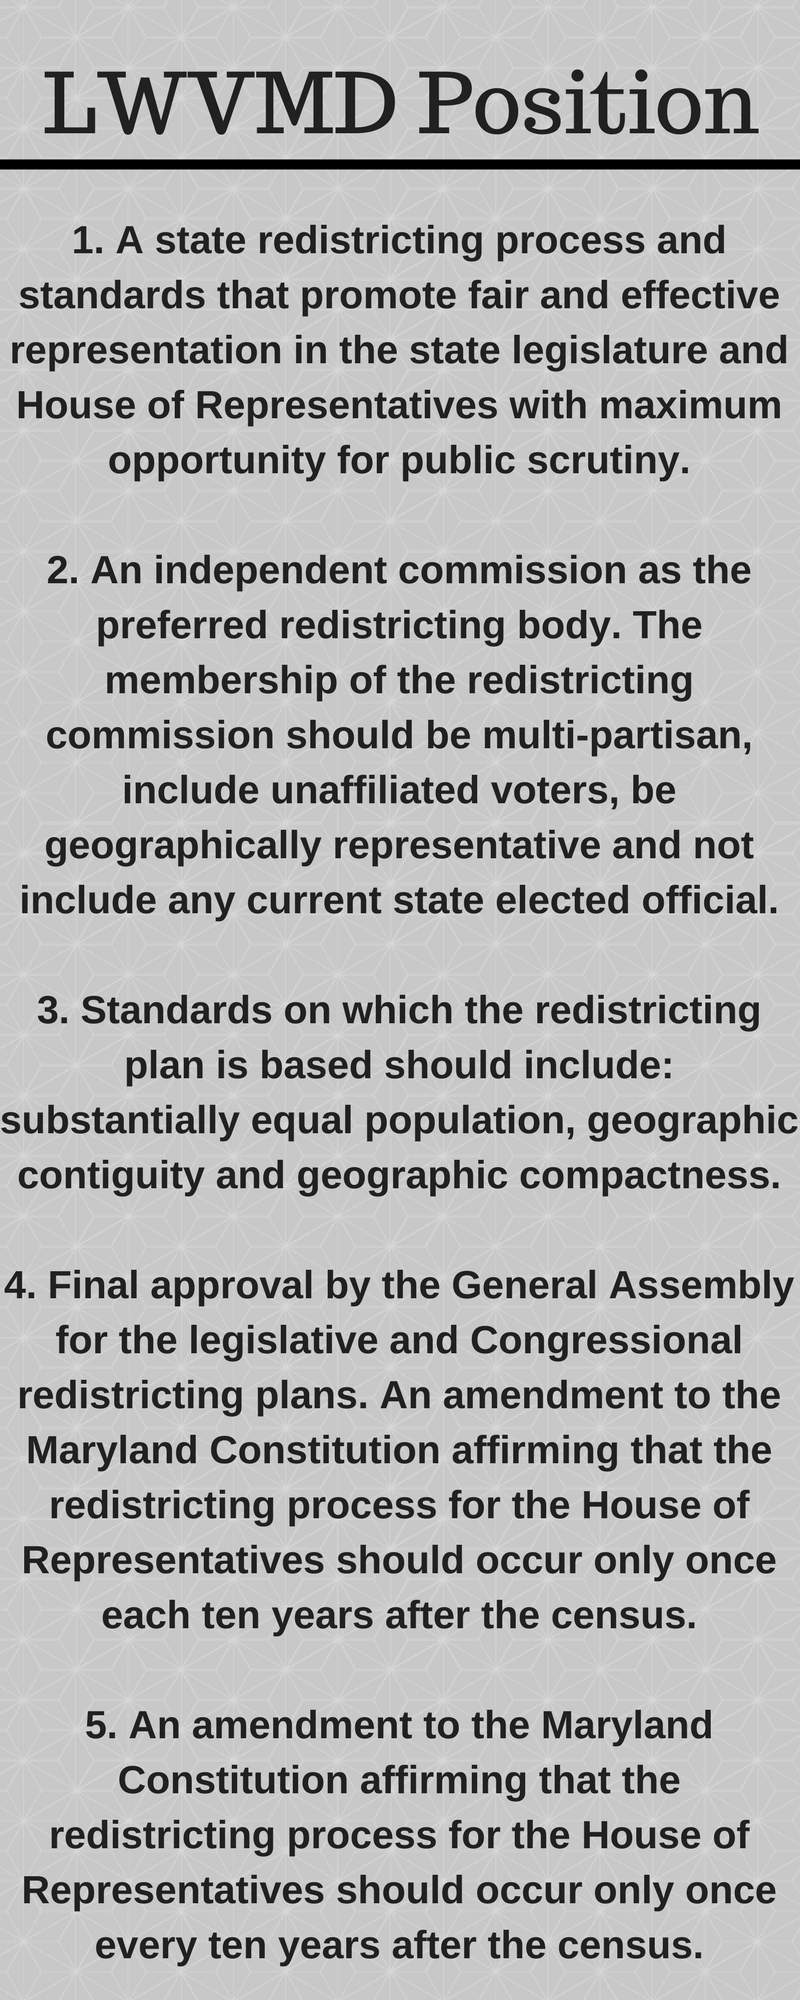 LWVMD Redistricting Position